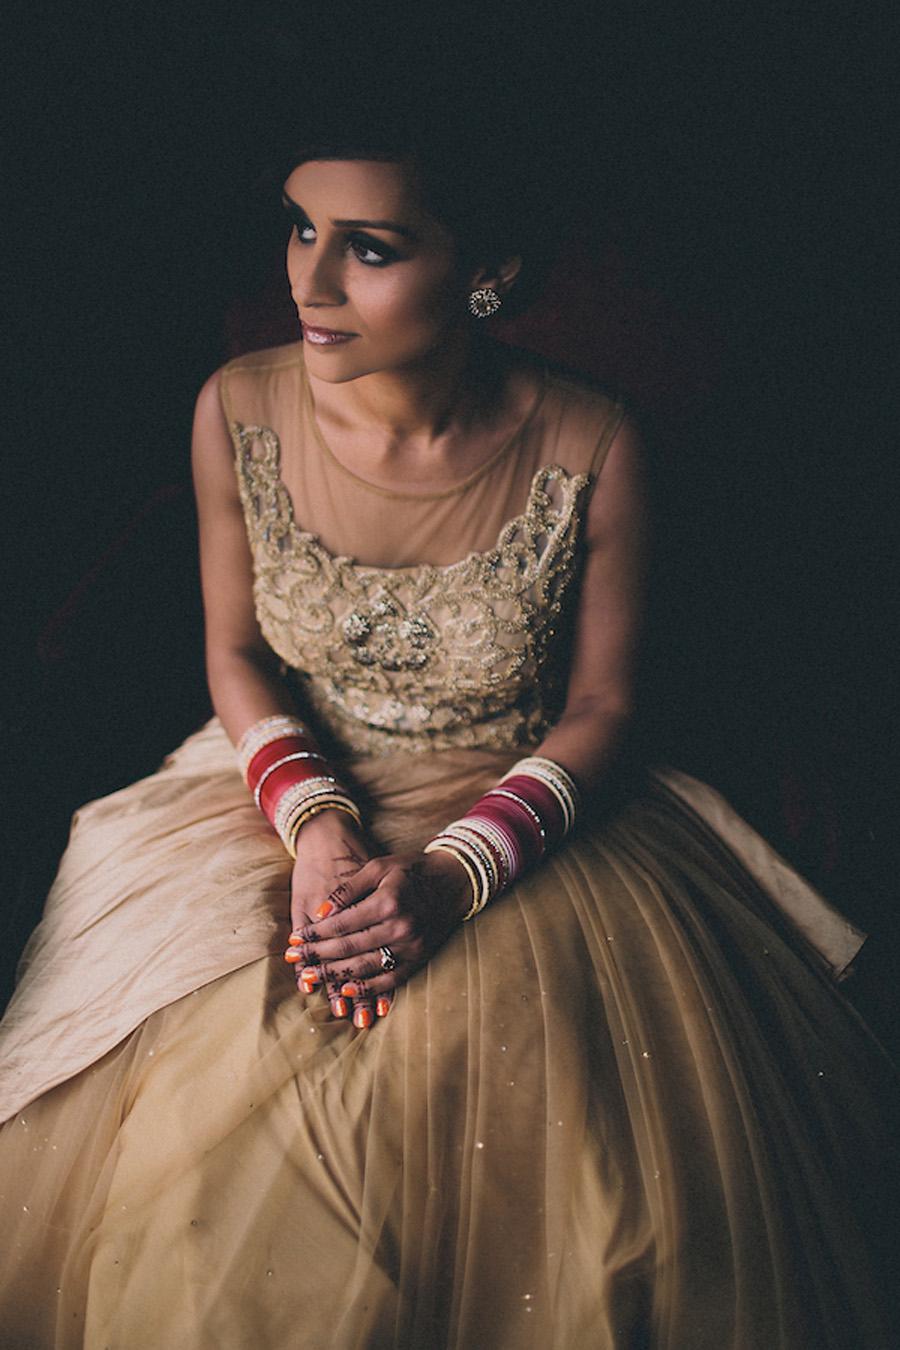 sikh-wedding-matthew-jones15